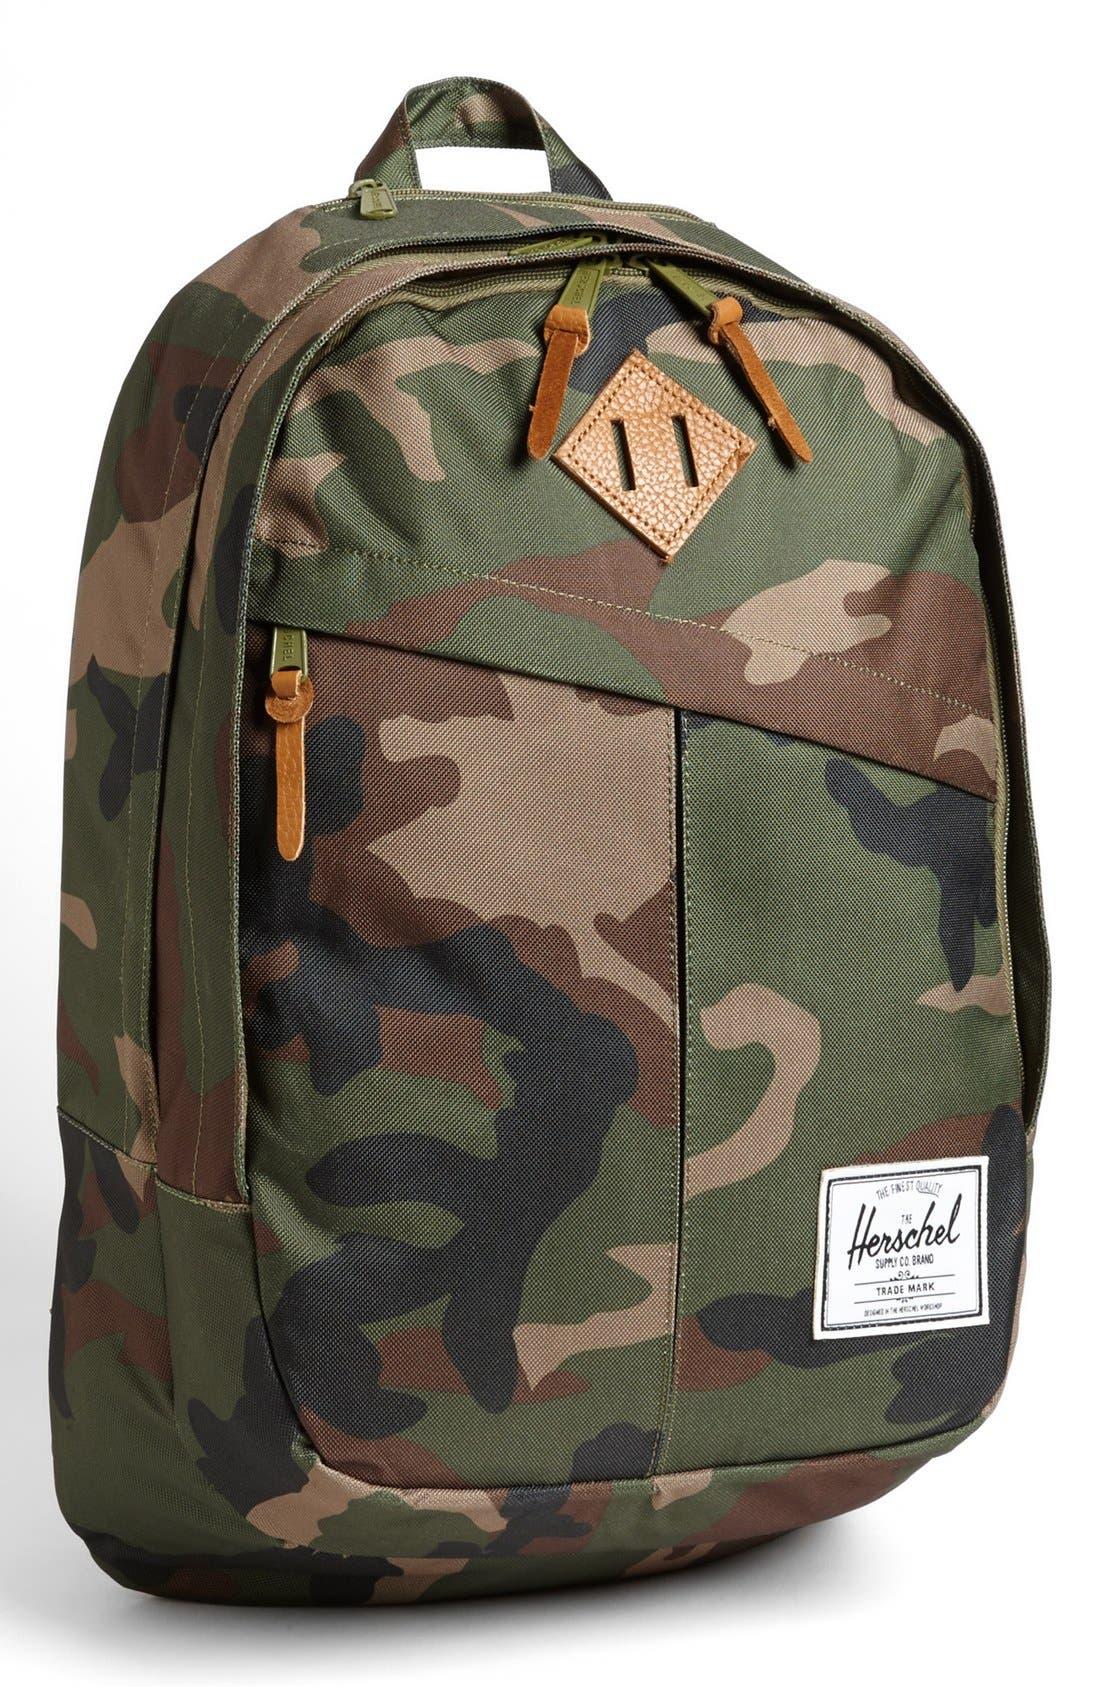 Main Image - Herschel Supply Co. 'Sierra' Backpack